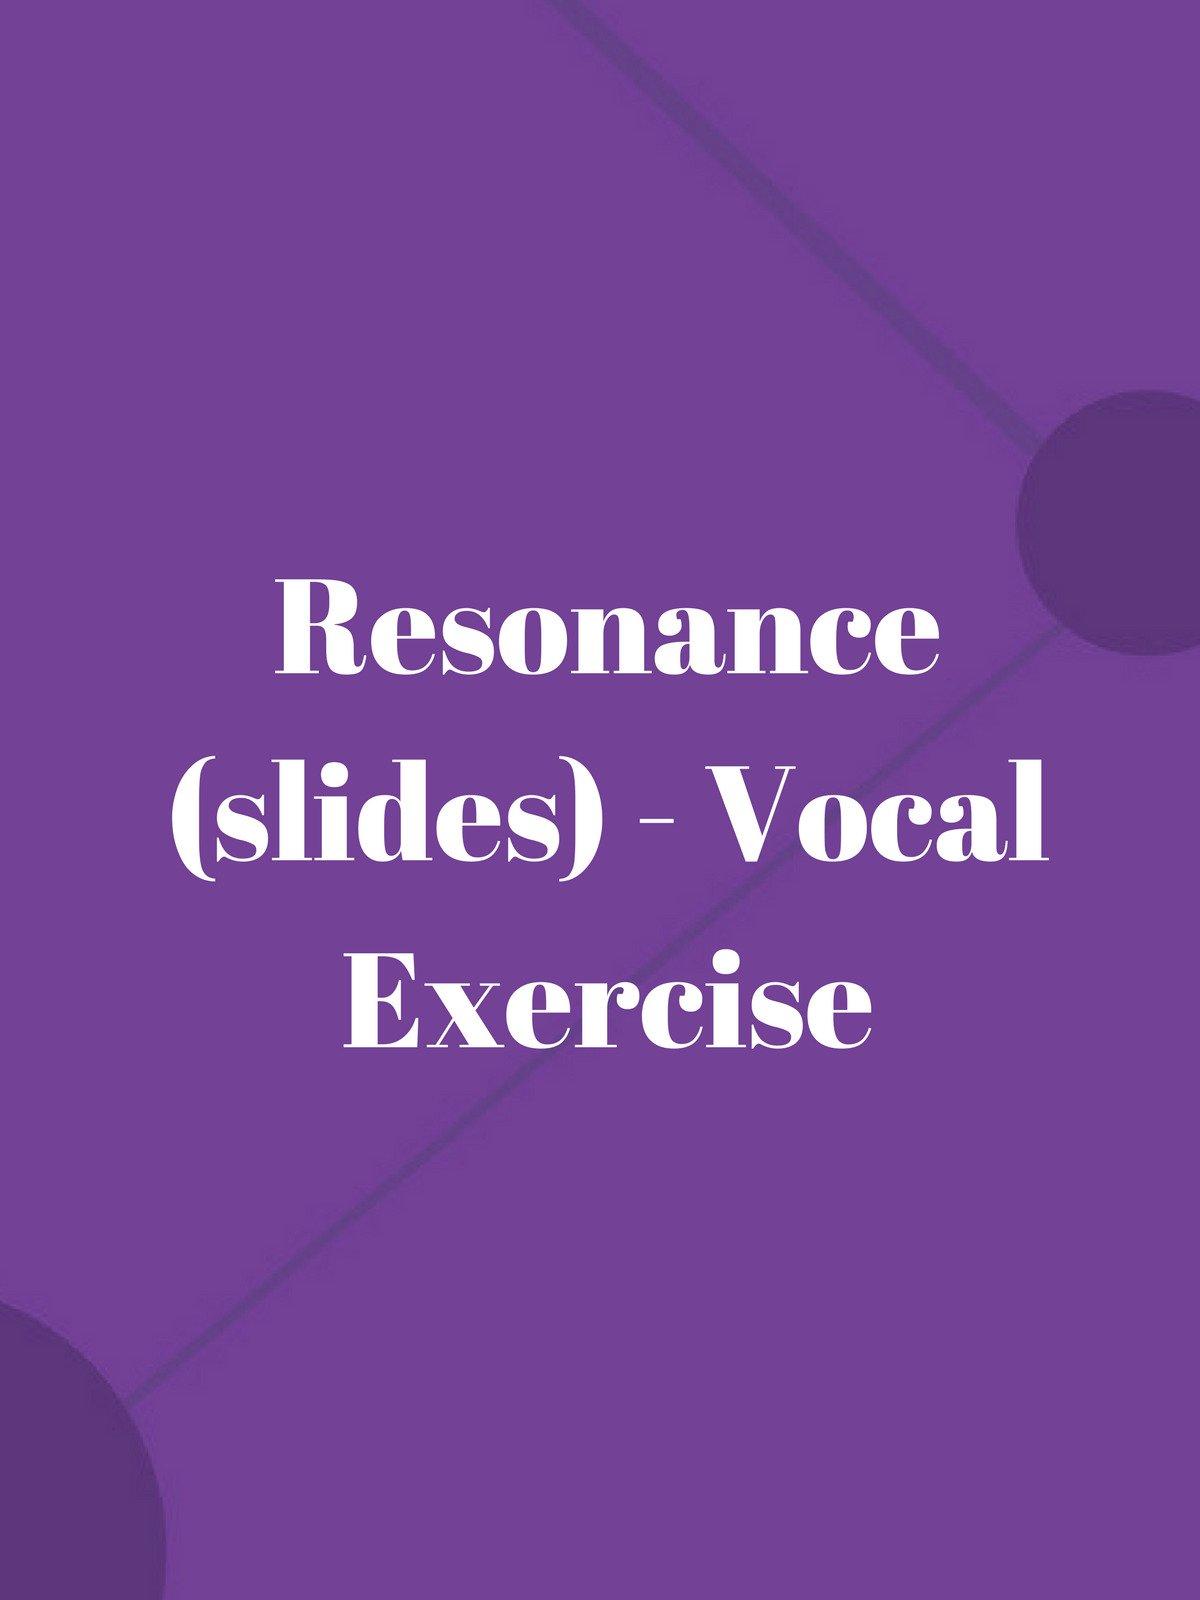 Resonance (slides)